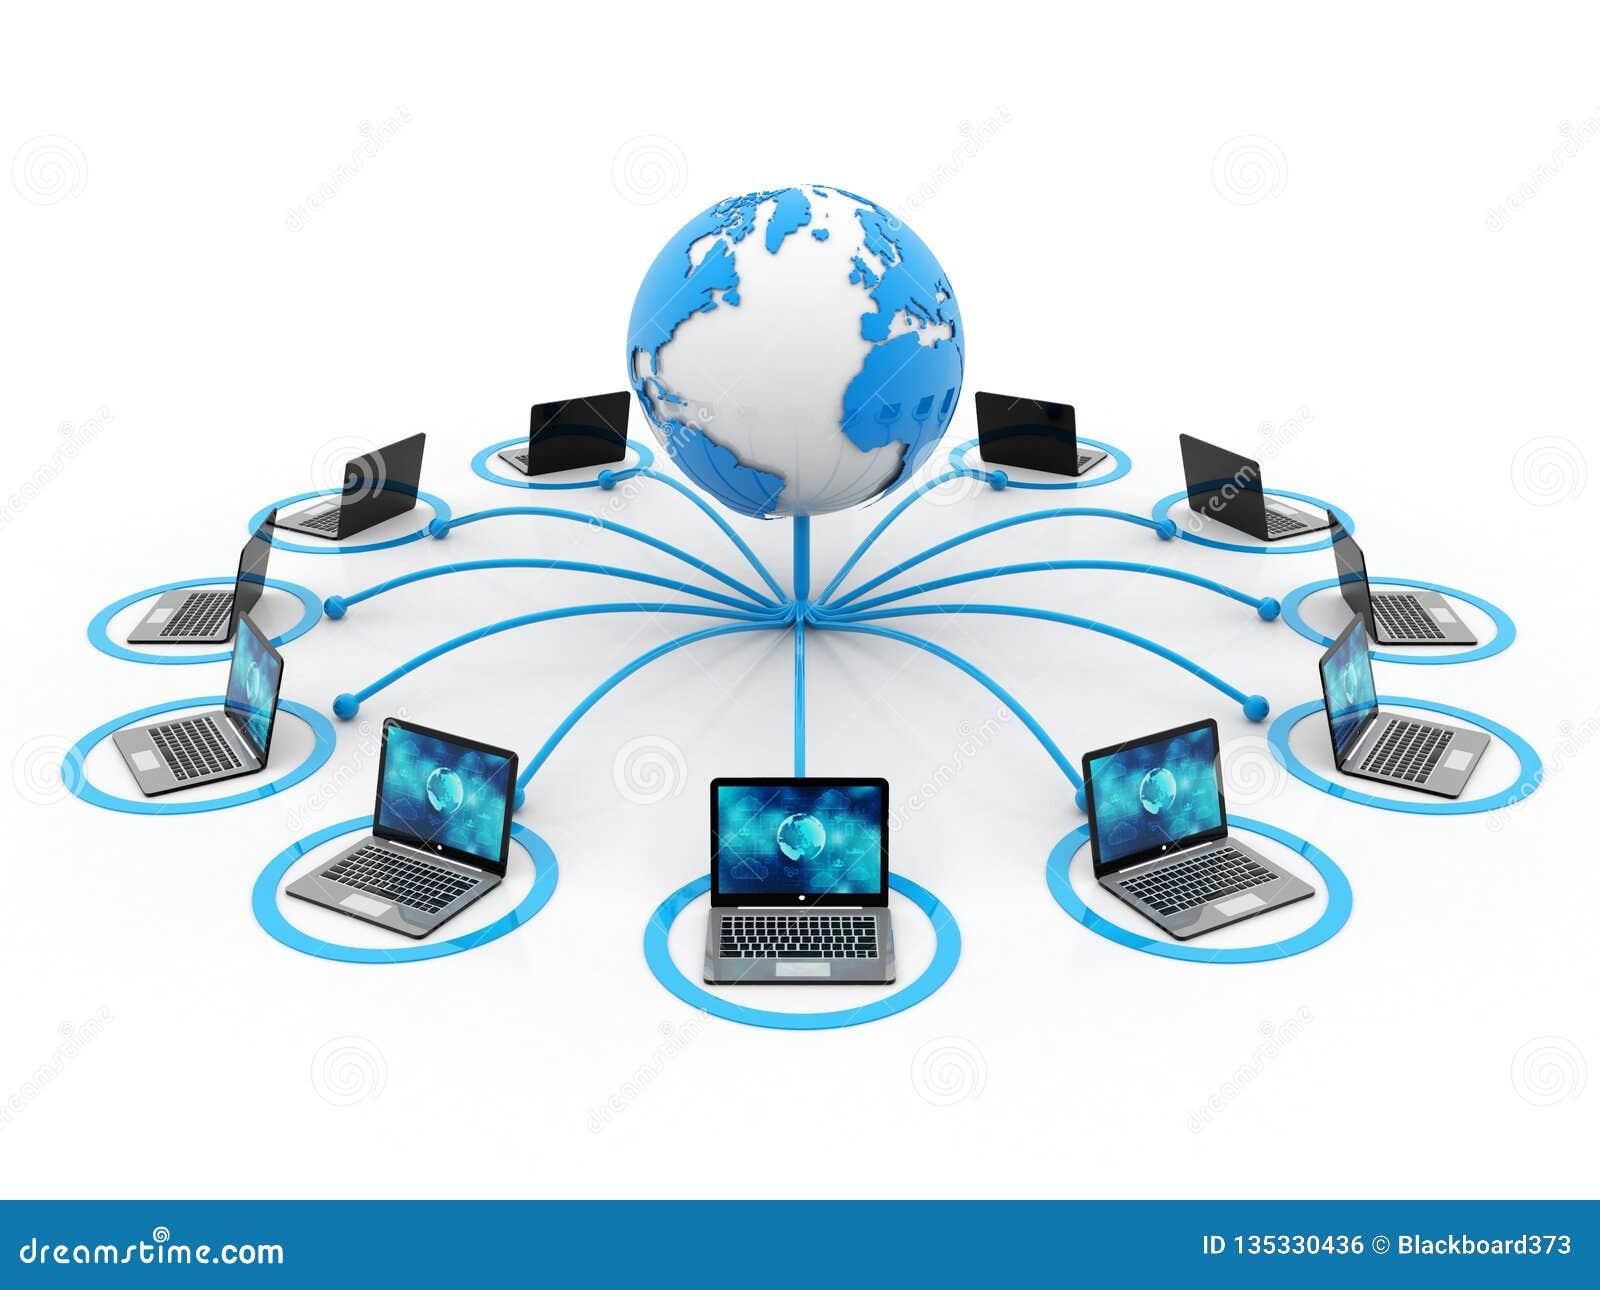 Réseau Informatique Global, Communication D'Internet 3d Rendent Illustration Stock - Illustration du global, communication: 135330436